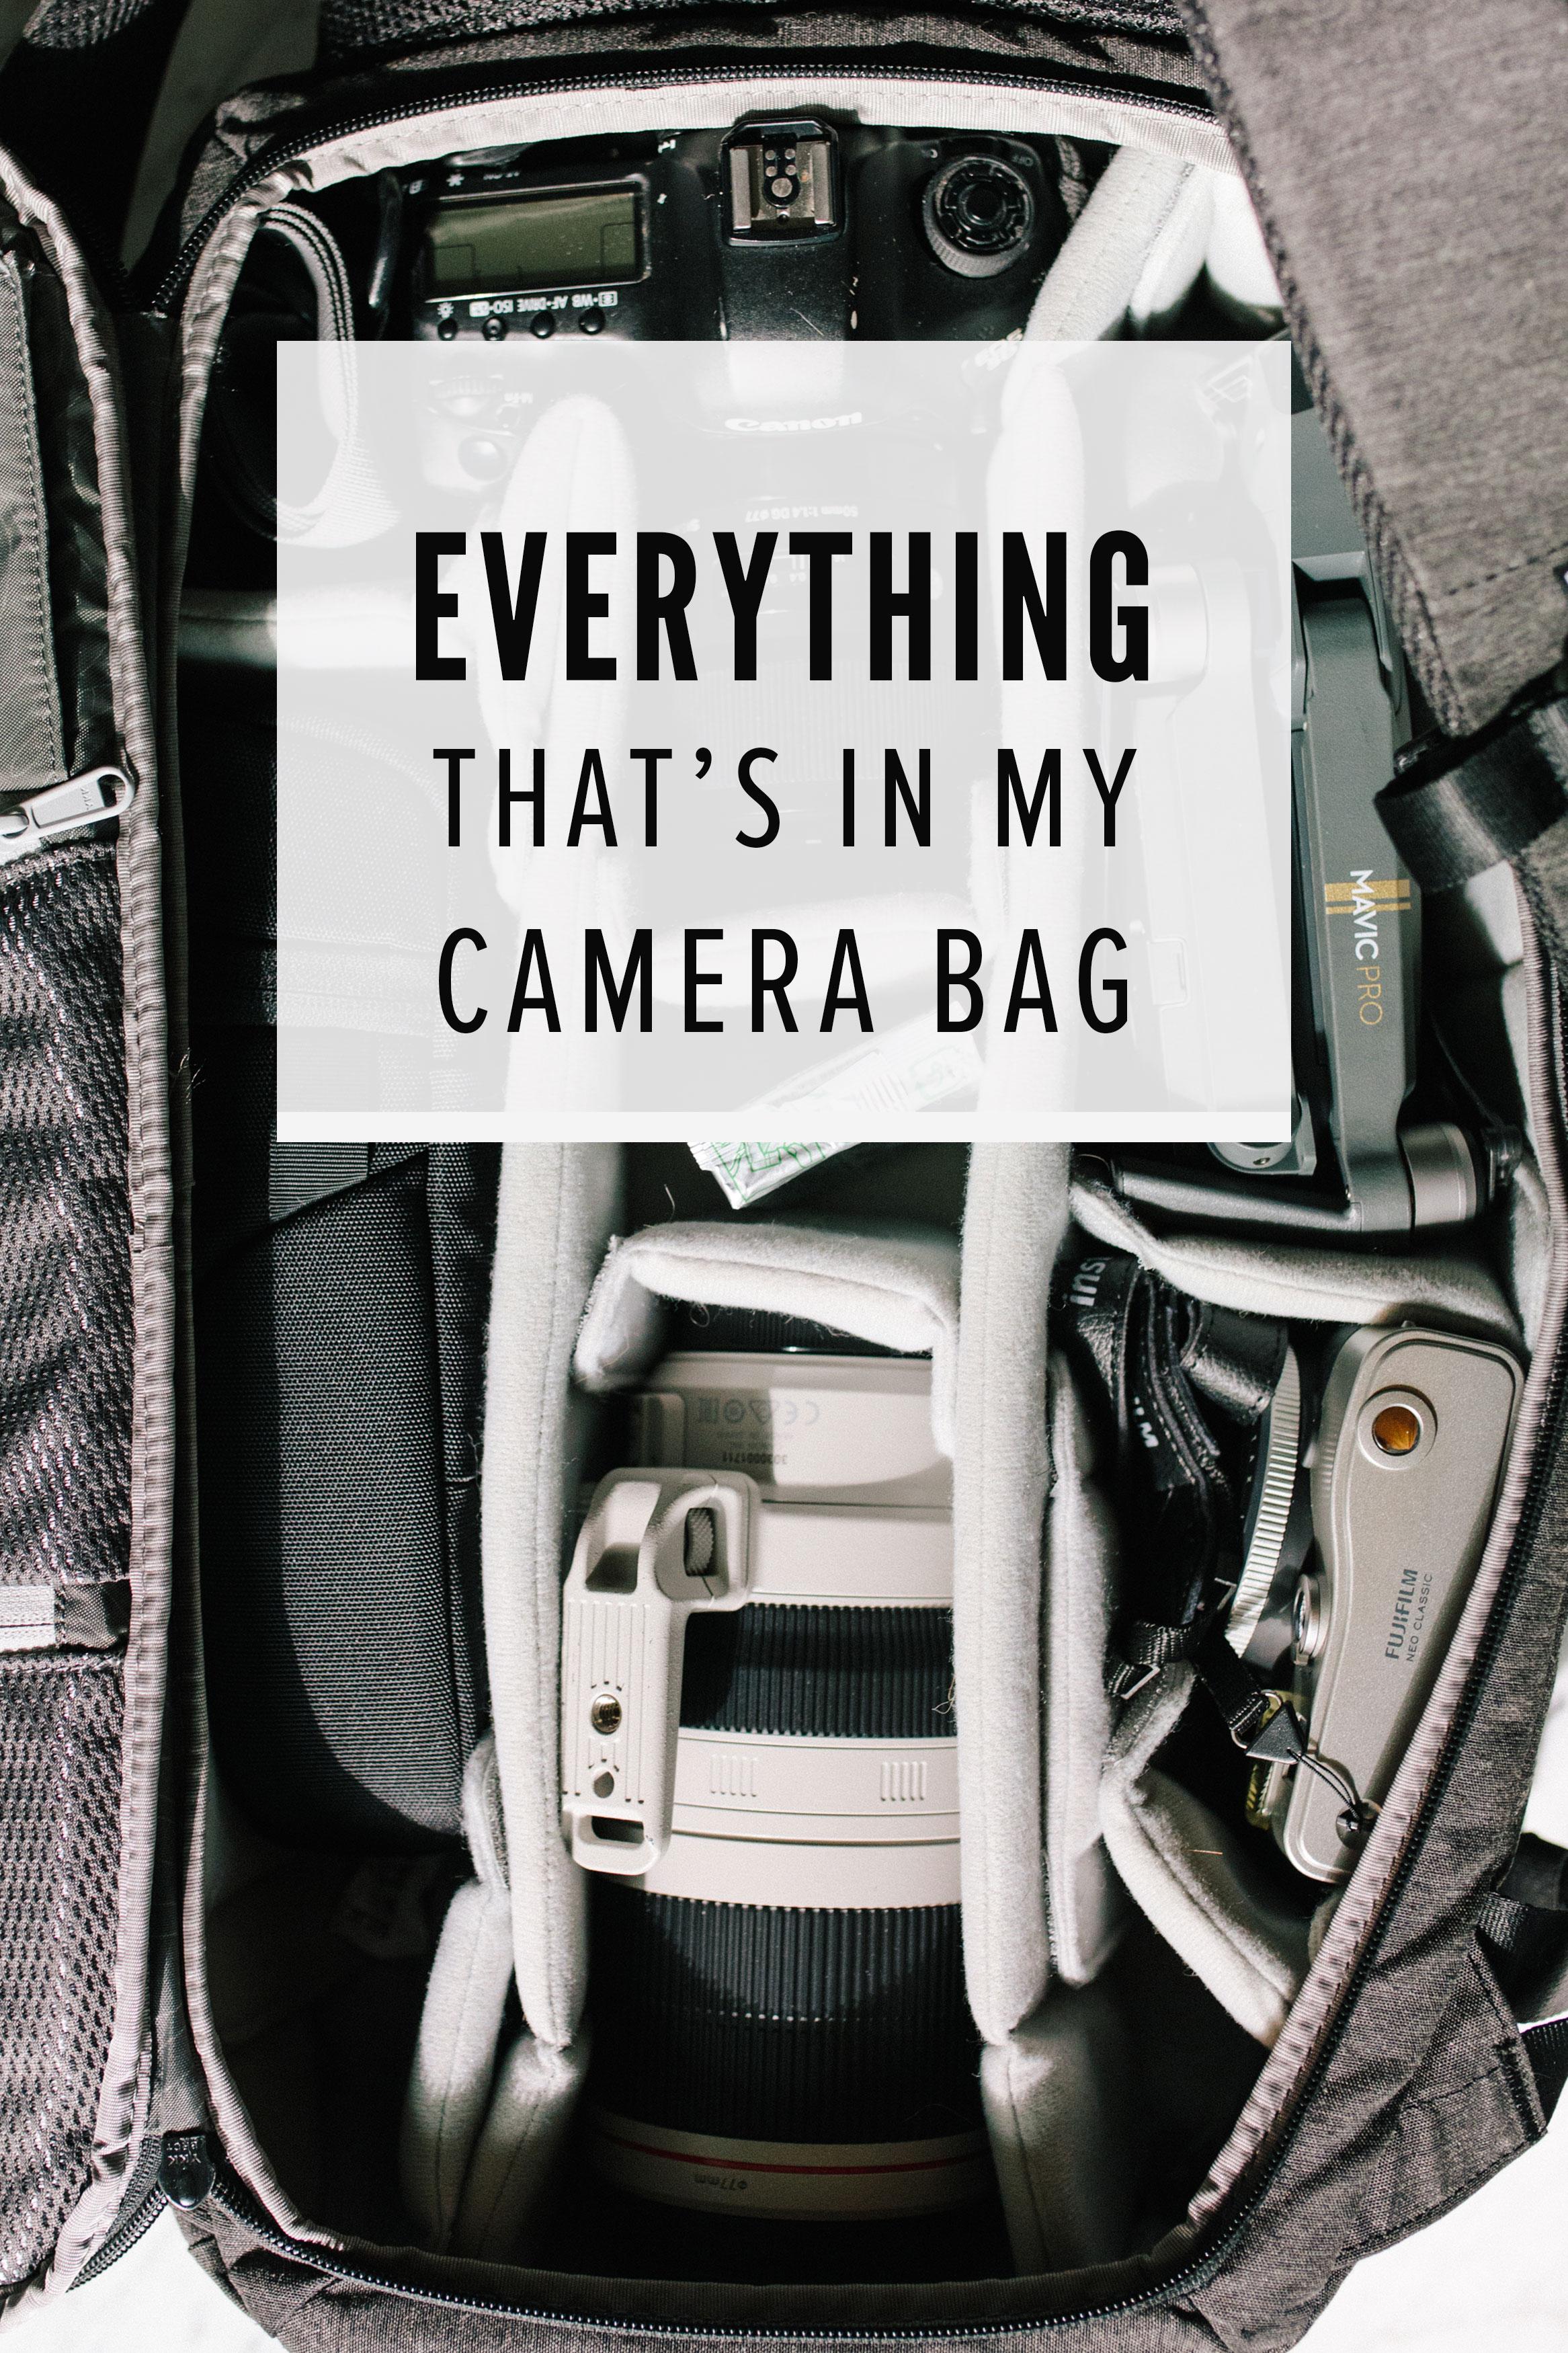 My Food & Travel Photography Gear List